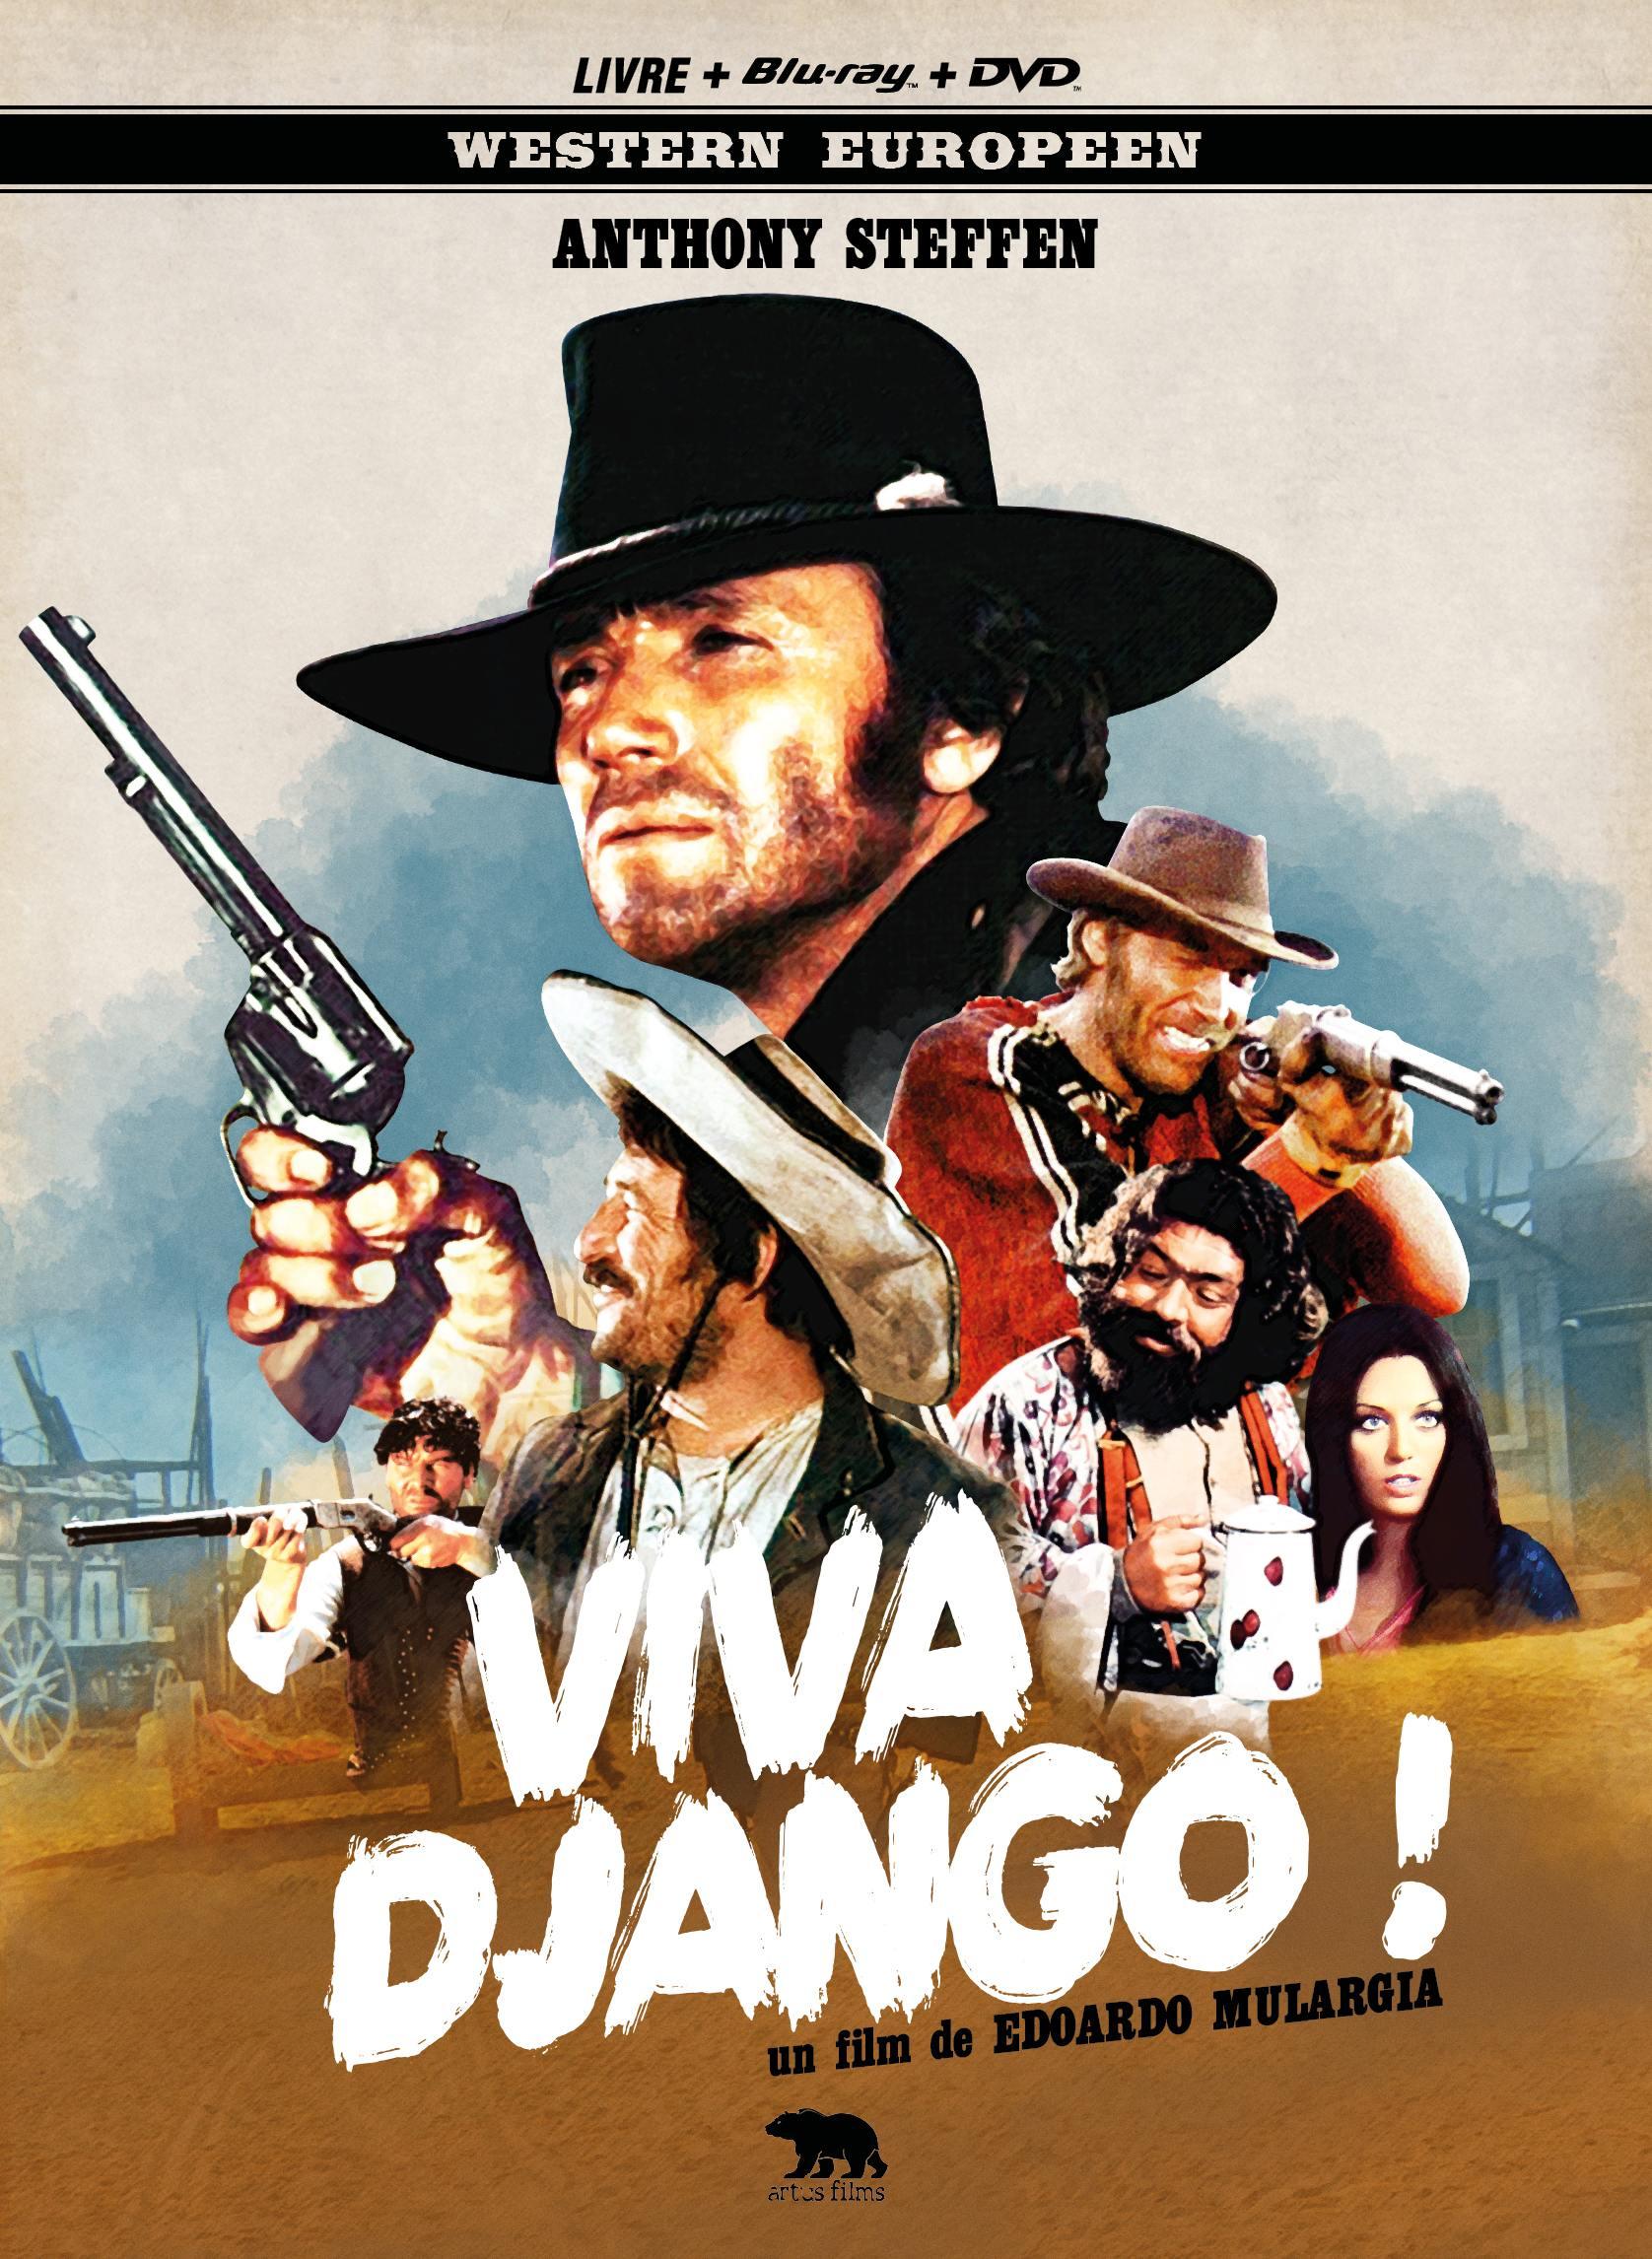 Viva django - combo dvd + blu-ray + livre - mediabook